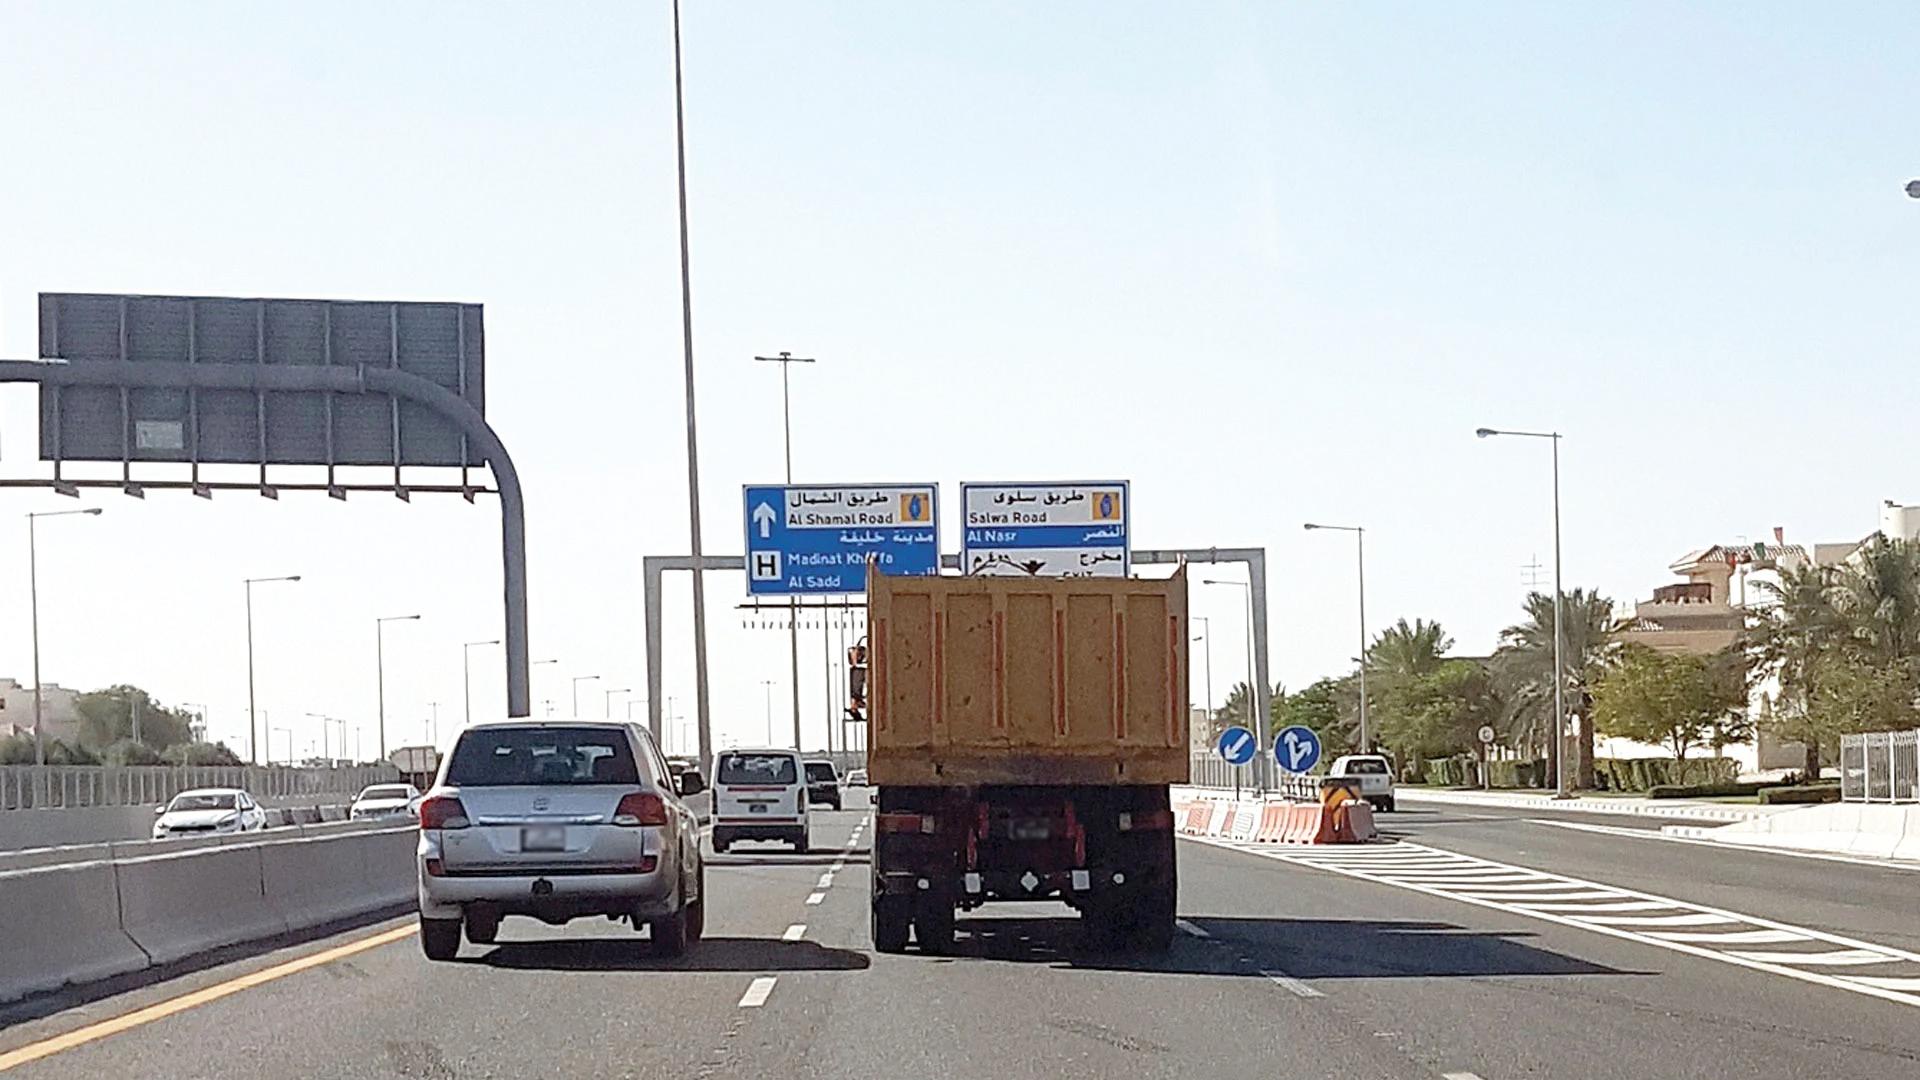 Trucks driving in center lanes